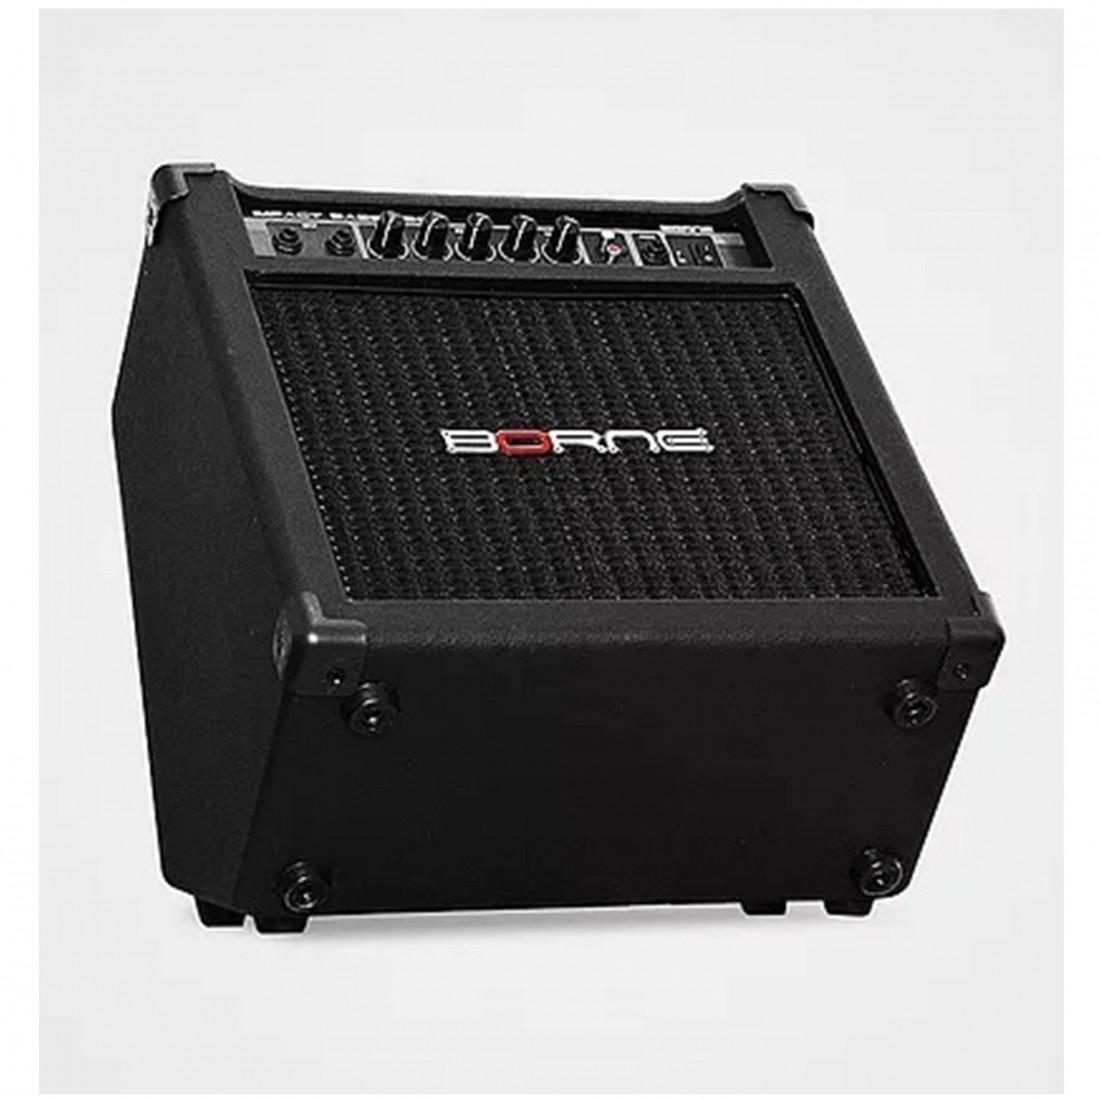 Foto2 - Caixa Amplificada Baixo Borne Impact Bass CB80 30 watts